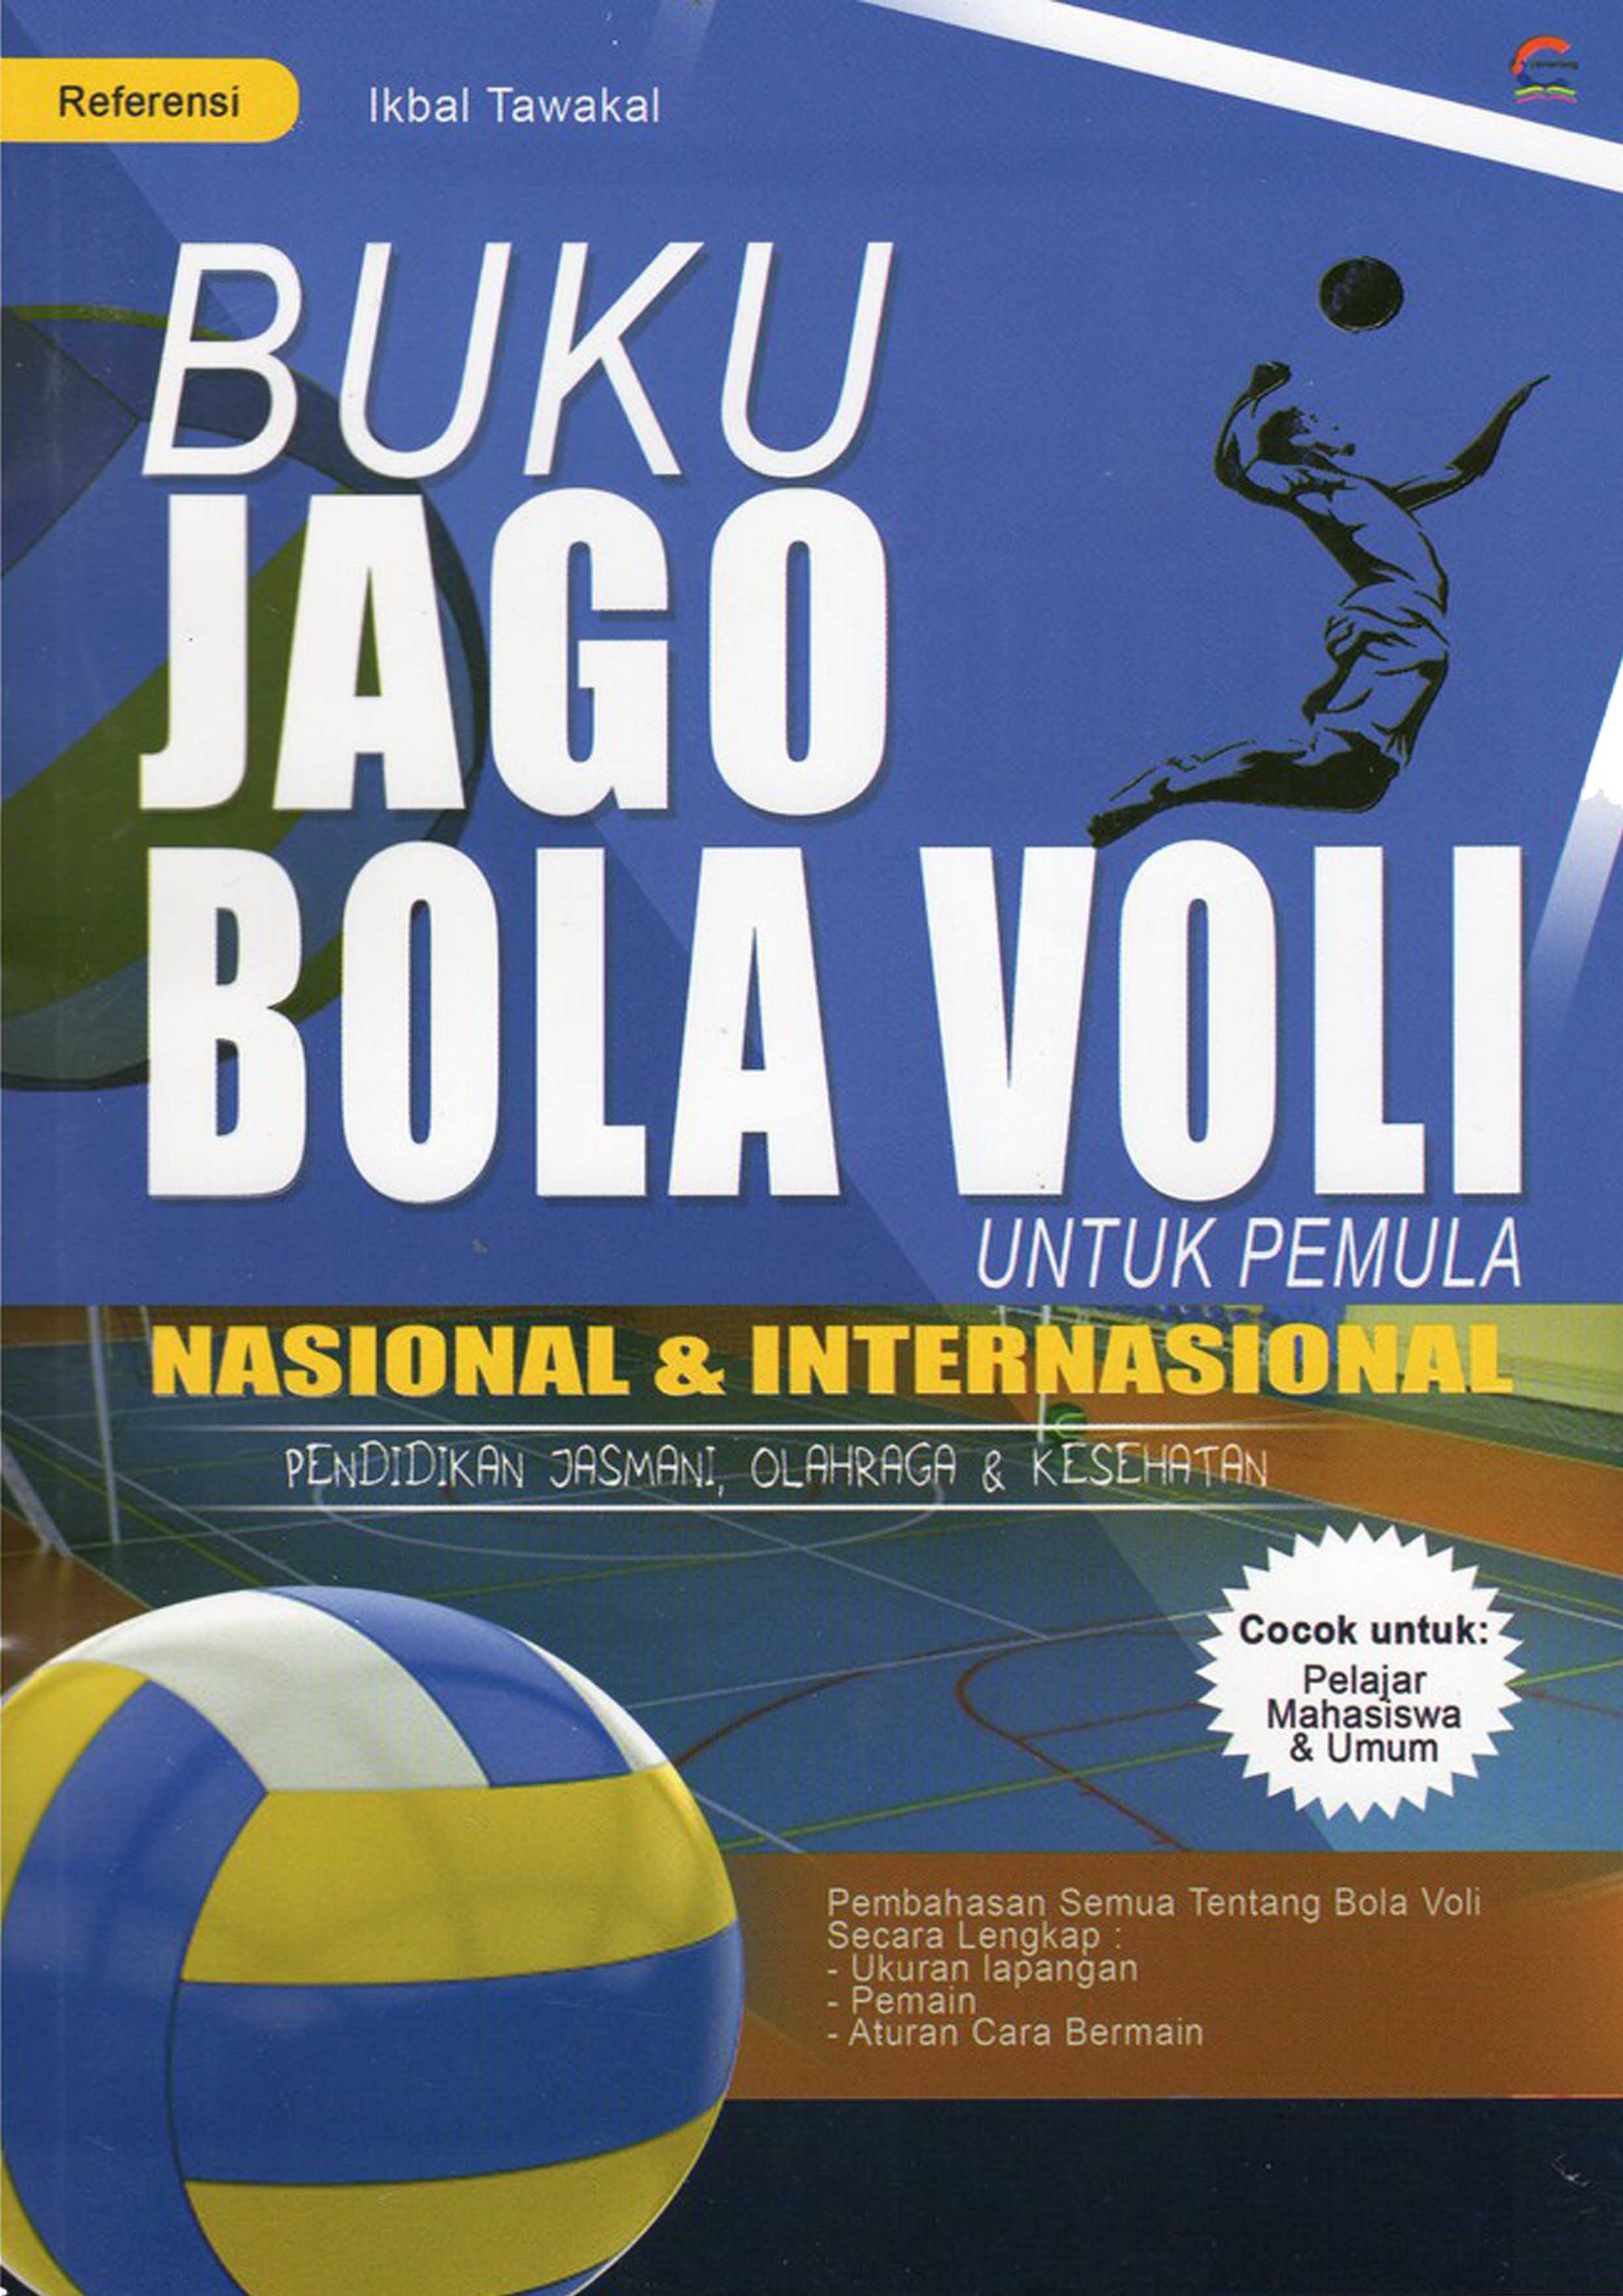 Buku Buku Jago Bola Ikbal Tawakal Mizanstore